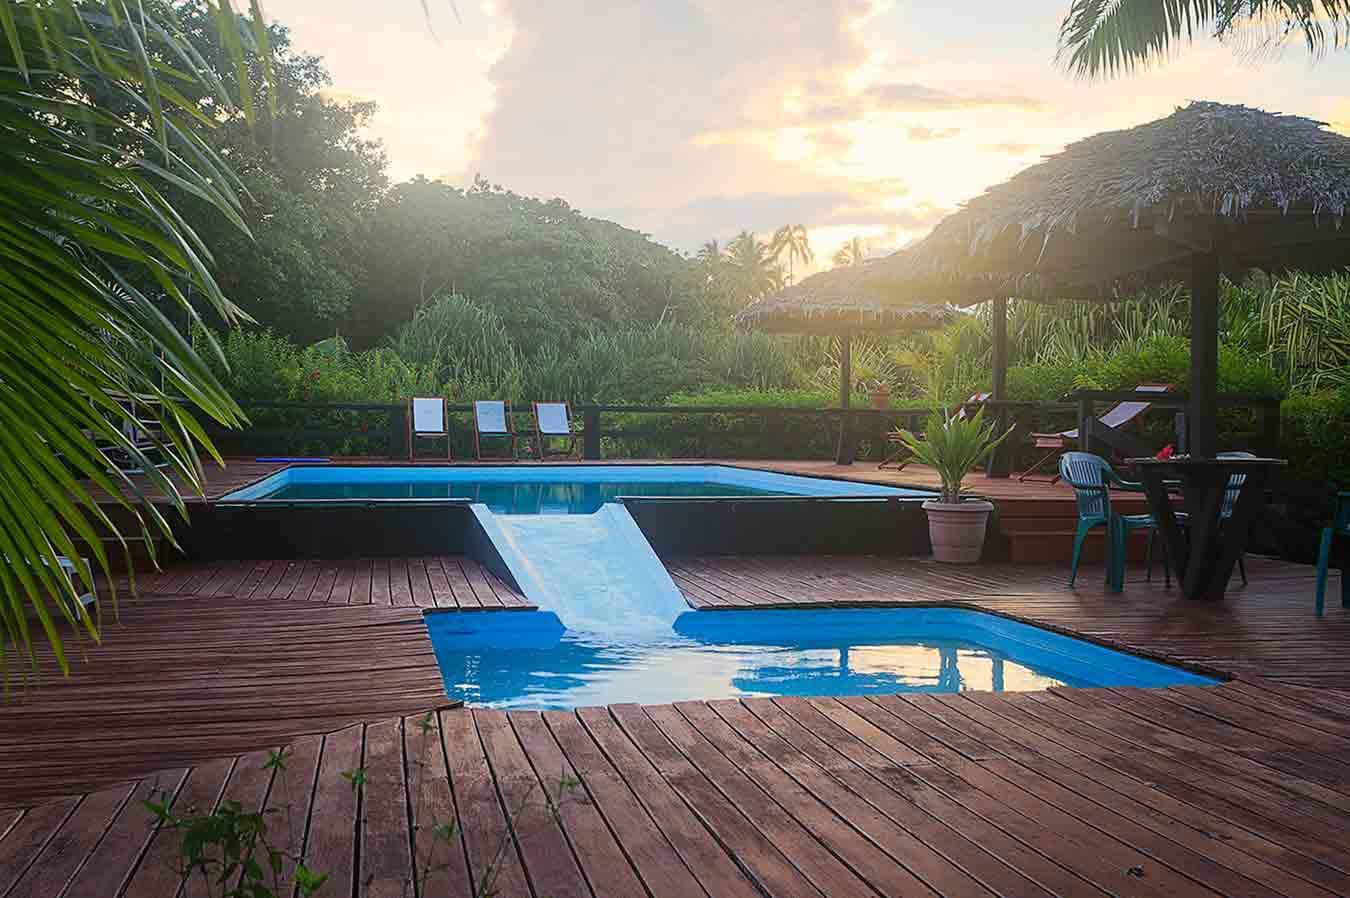 Swimming pool at sunset at Turtle Bay Lodge